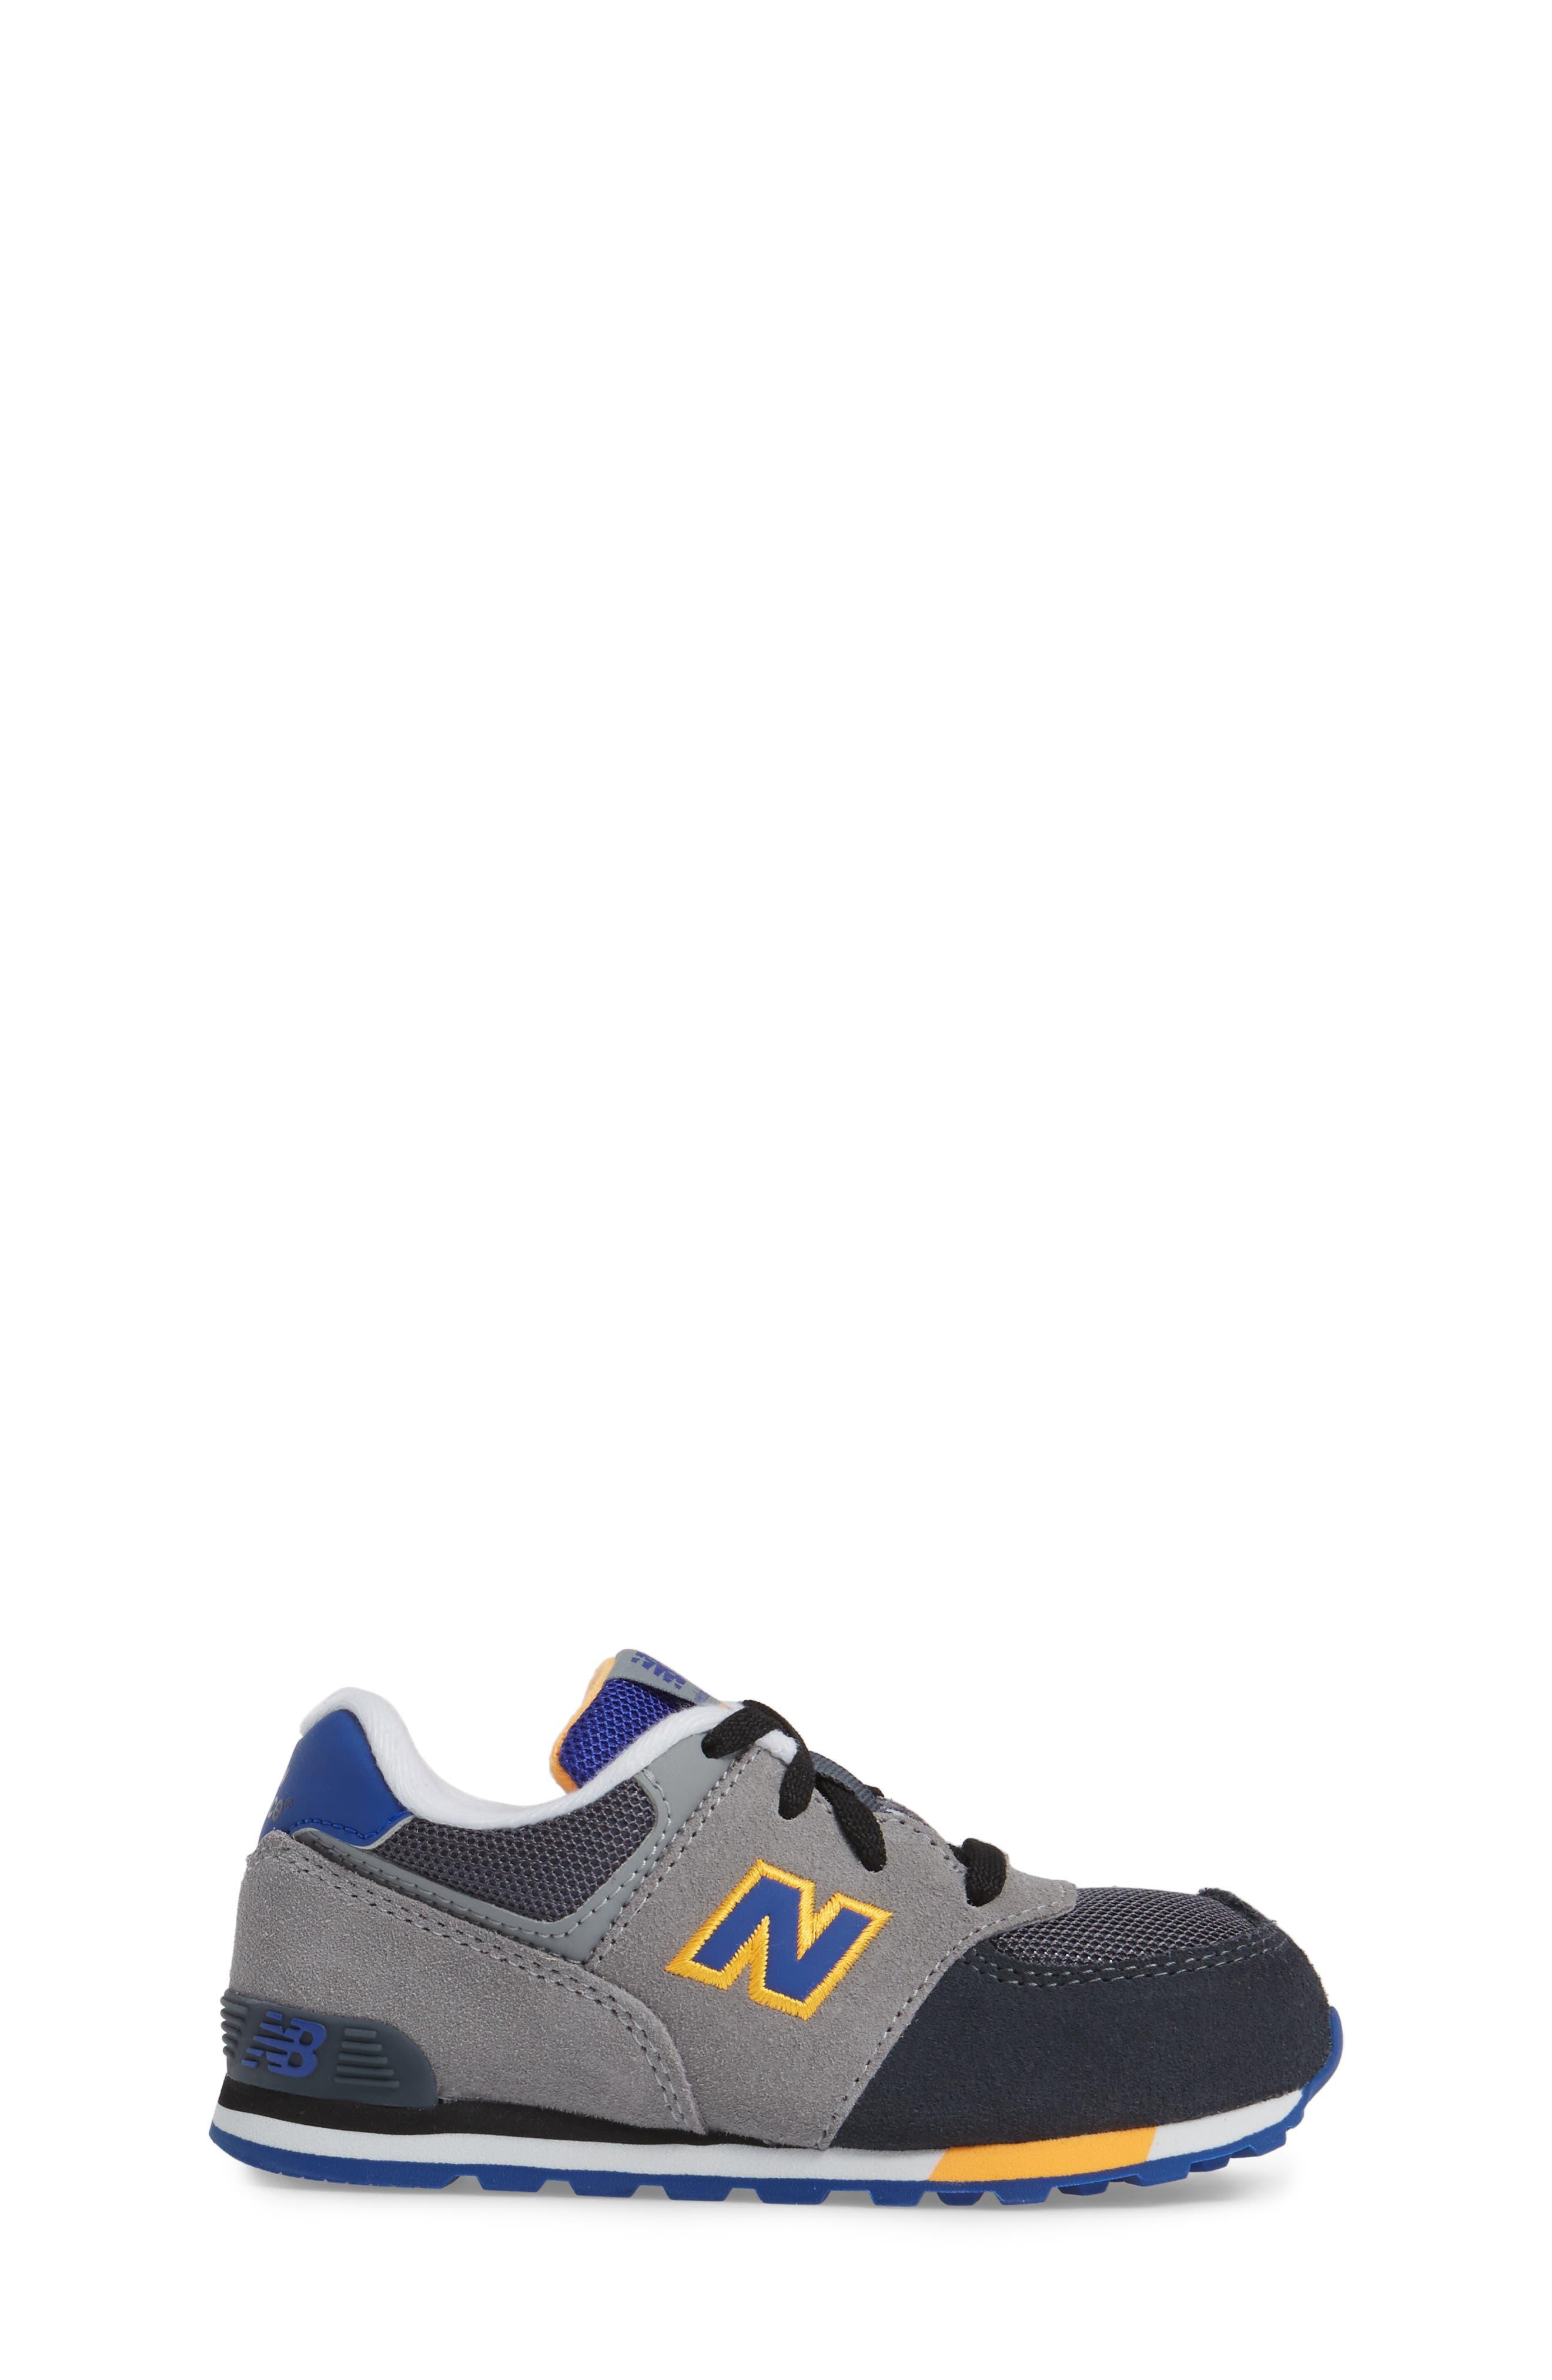 574 Cut & Paste Sneaker,                             Alternate thumbnail 3, color,